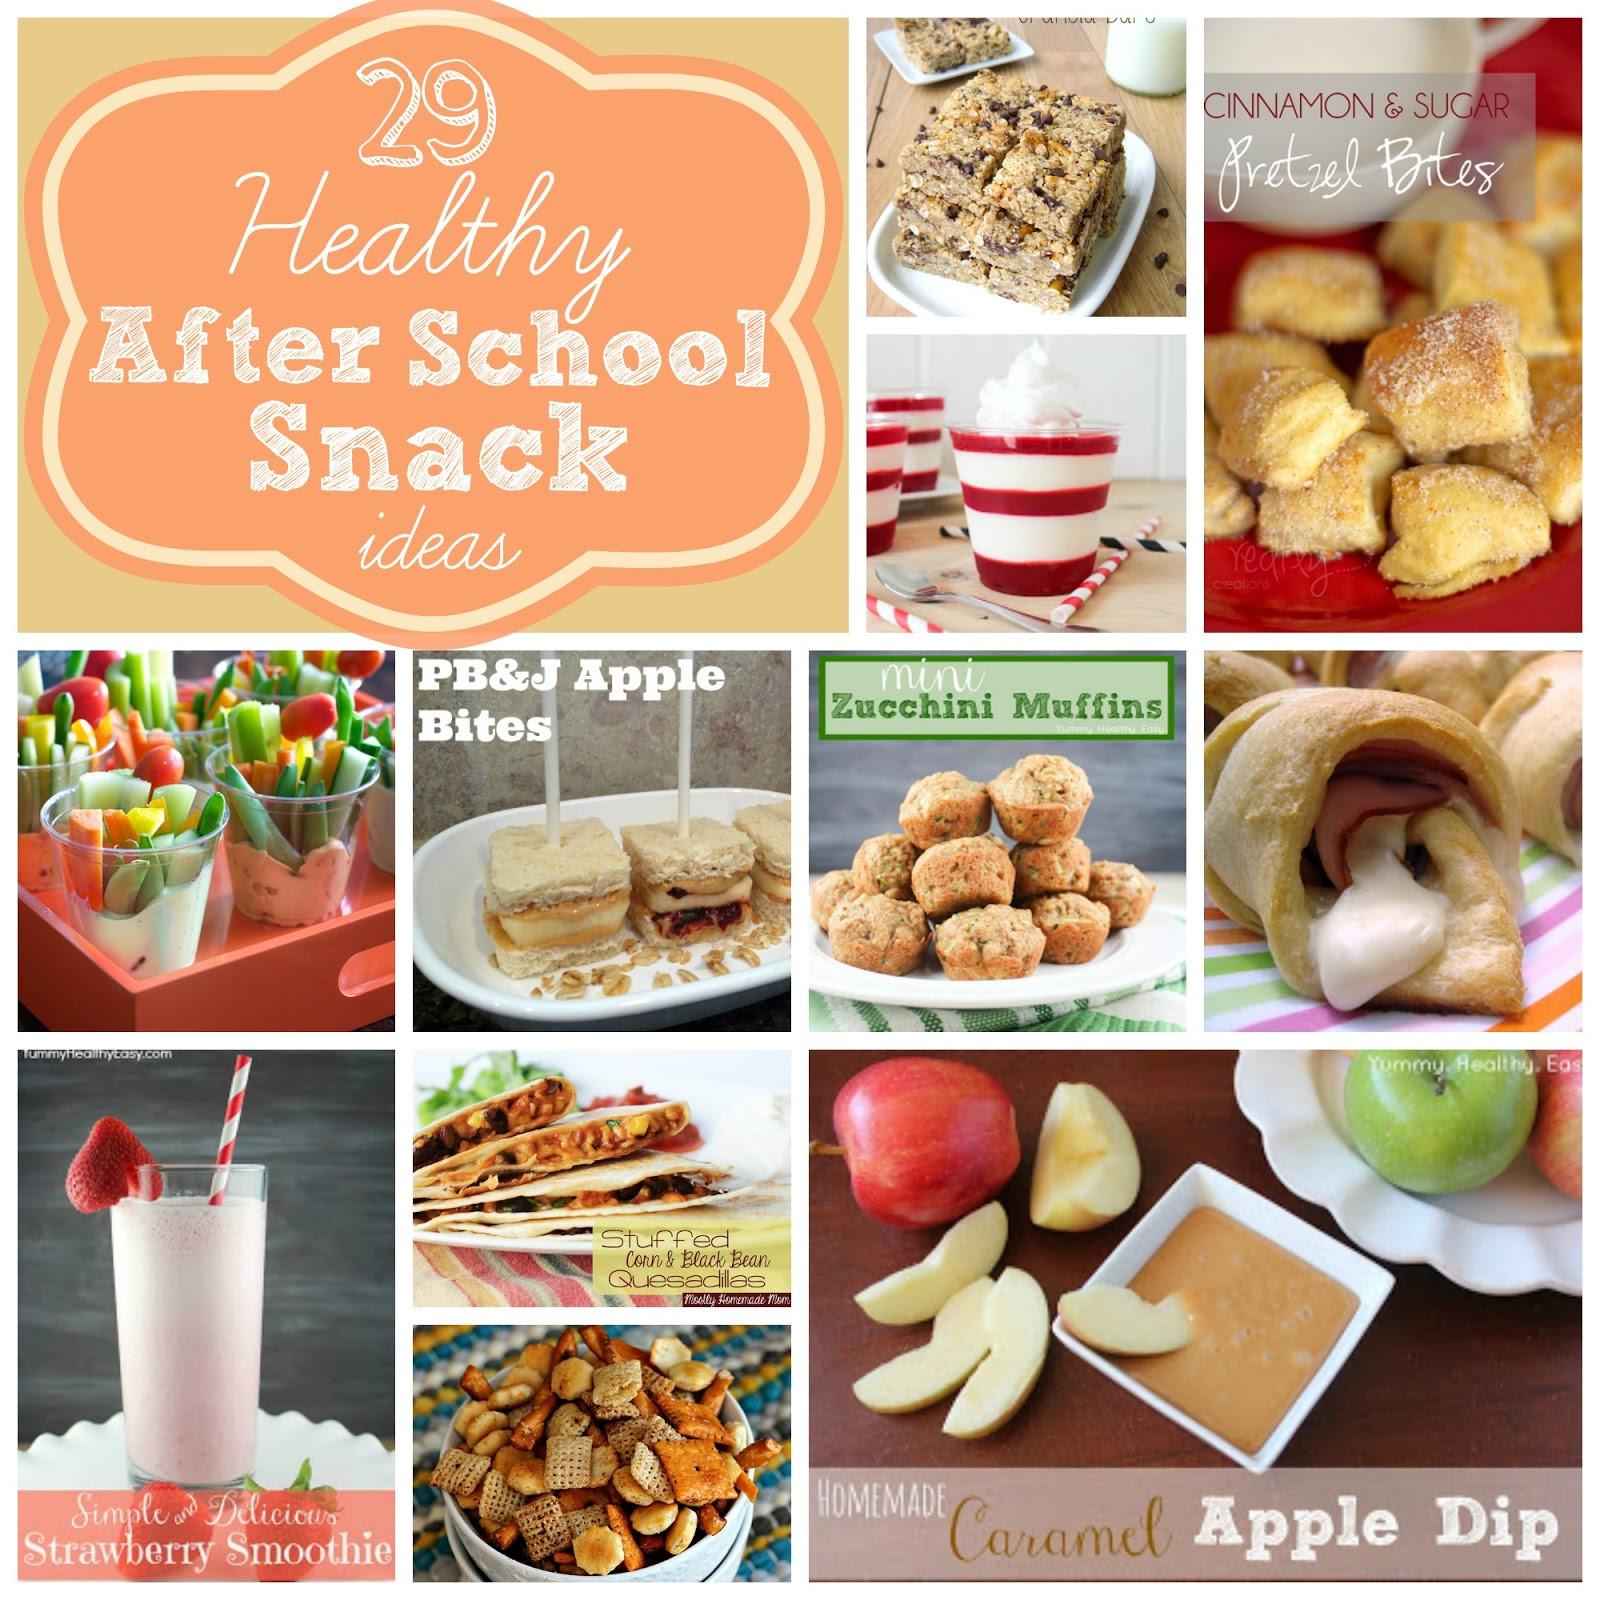 Healthy Afterschool Snacks  29 Healthy After School Snack Ideas Yummy Healthy Easy